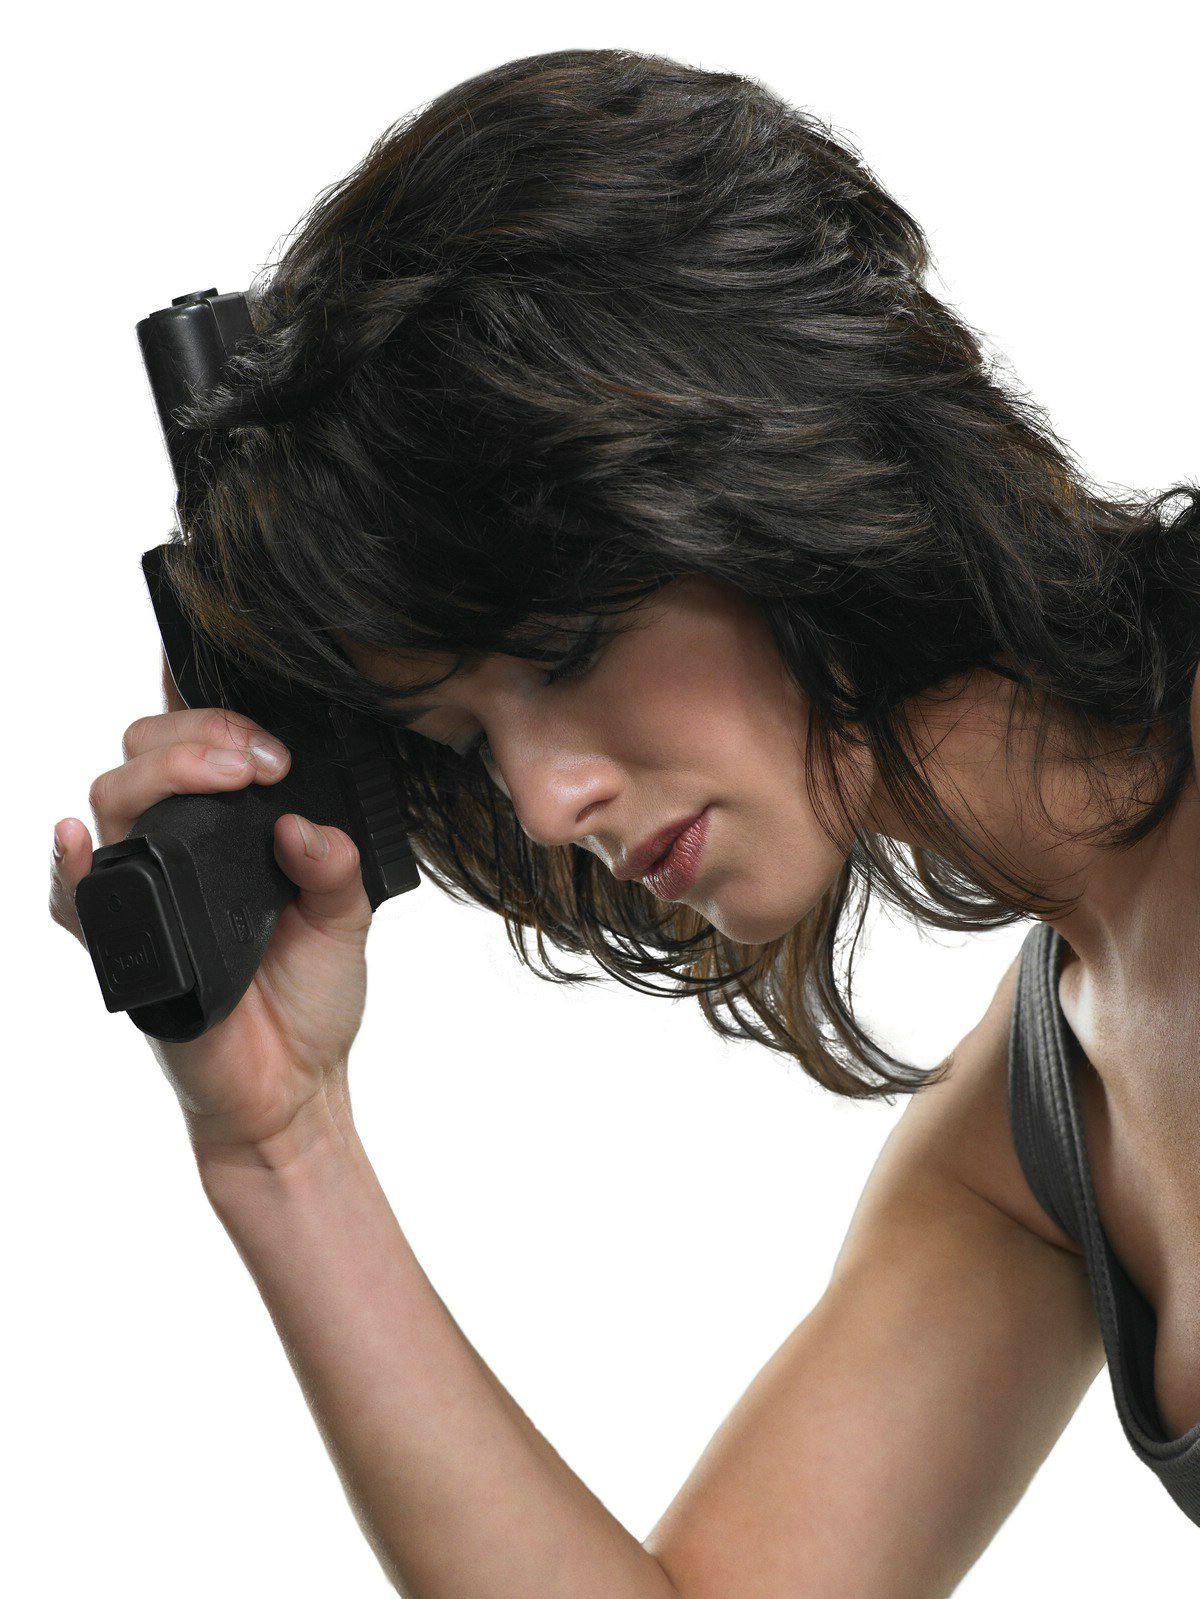 http://1.bp.blogspot.com/-ejC53OzuN7g/T1Y254cHjHI/AAAAAAAAMWY/19kU6c_qthY/s1600/Terminator+-+The+Sarah+Connor+Chronicles+(1).jpeg